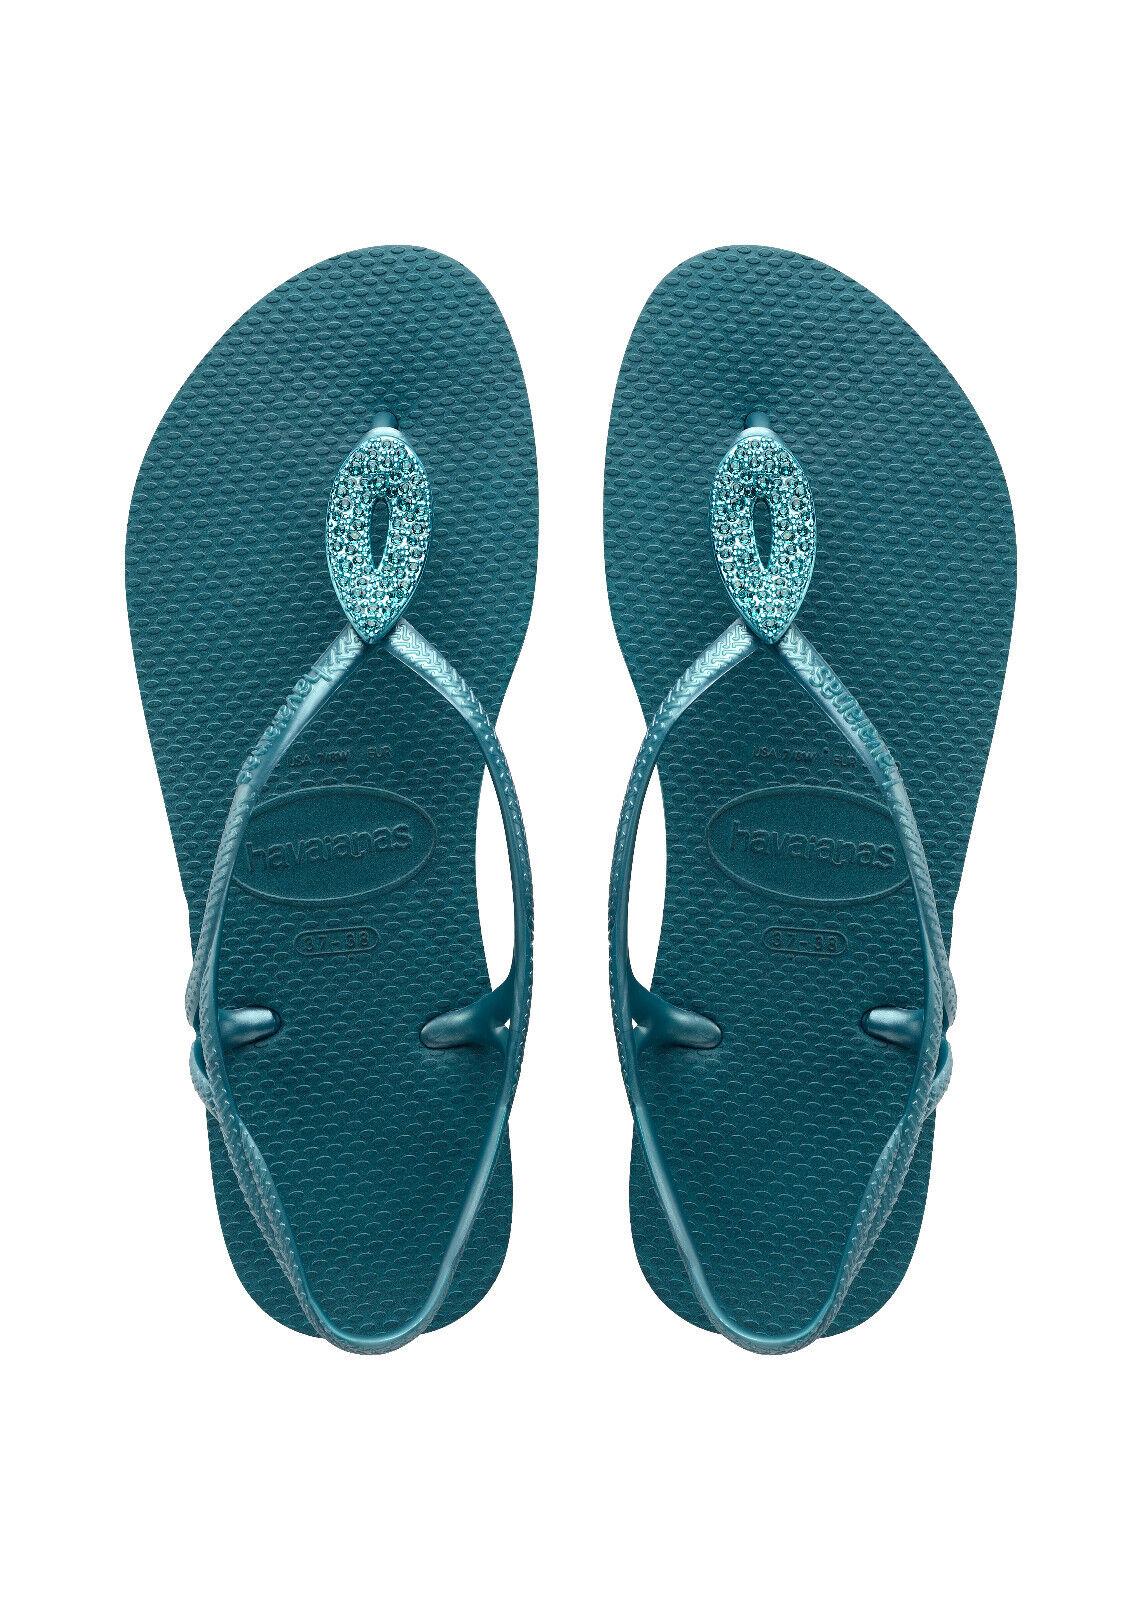 HAVAIANAS Zehentrenner Badeschuhe Thong Sandale LUNA SPECIAL petroleum blau NEU